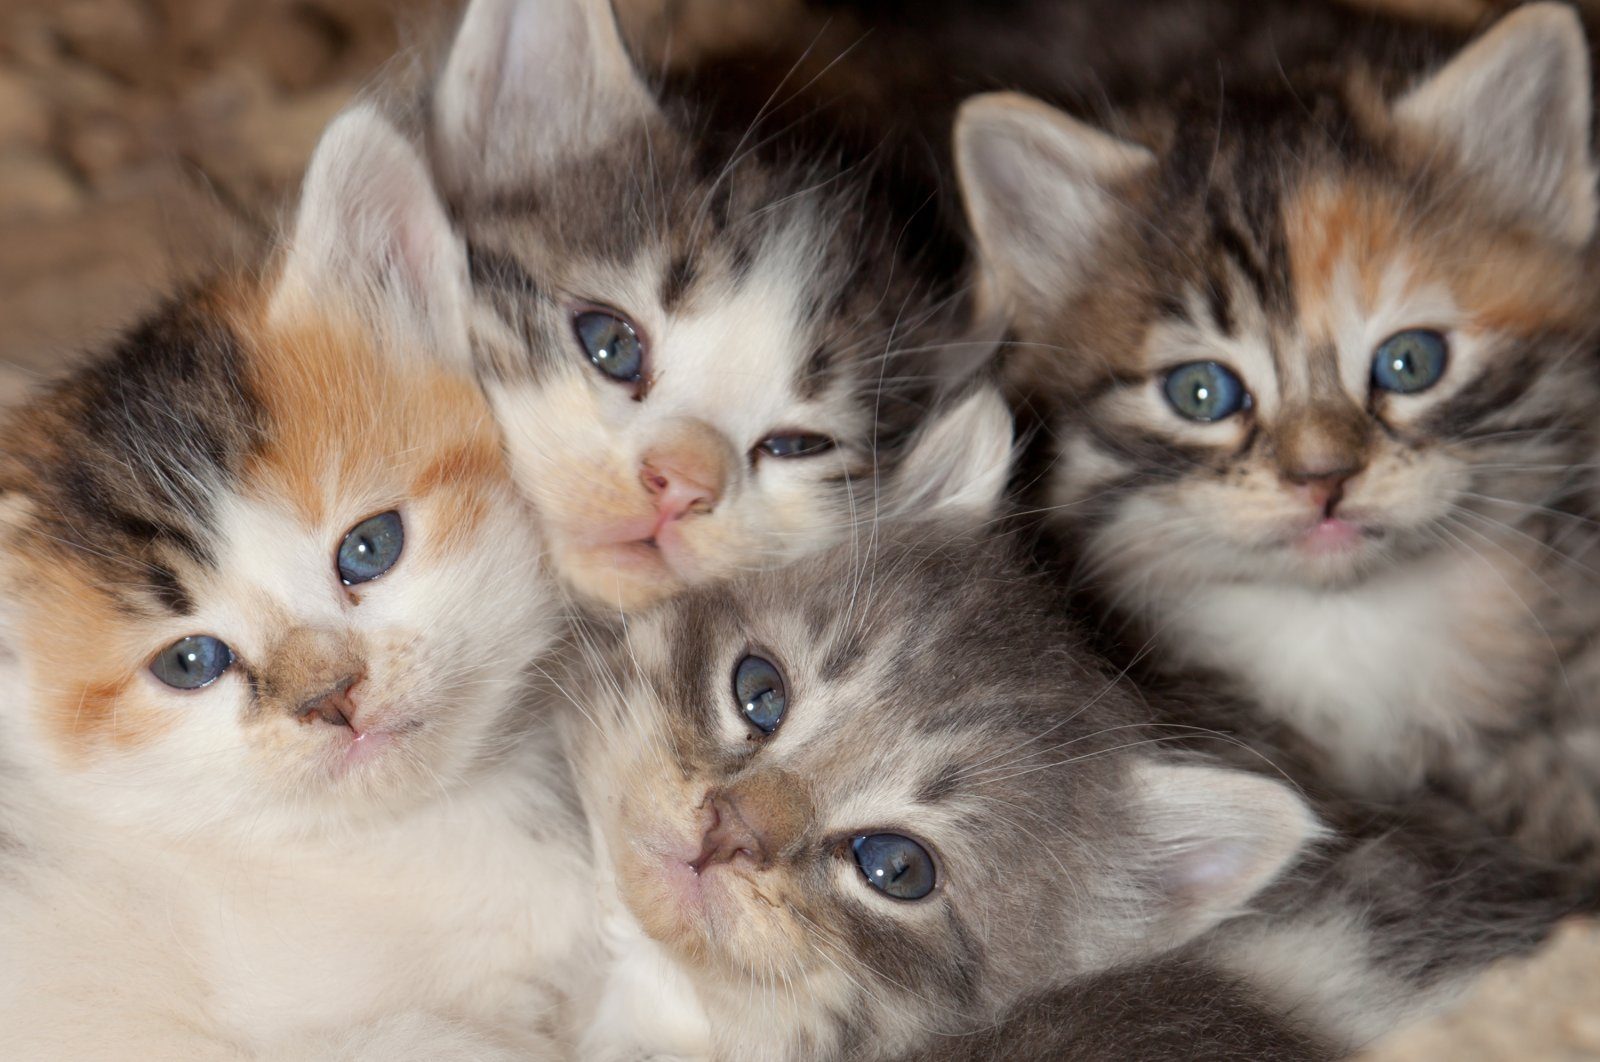 A litter of calico kittens. (Shutterstock Photo)